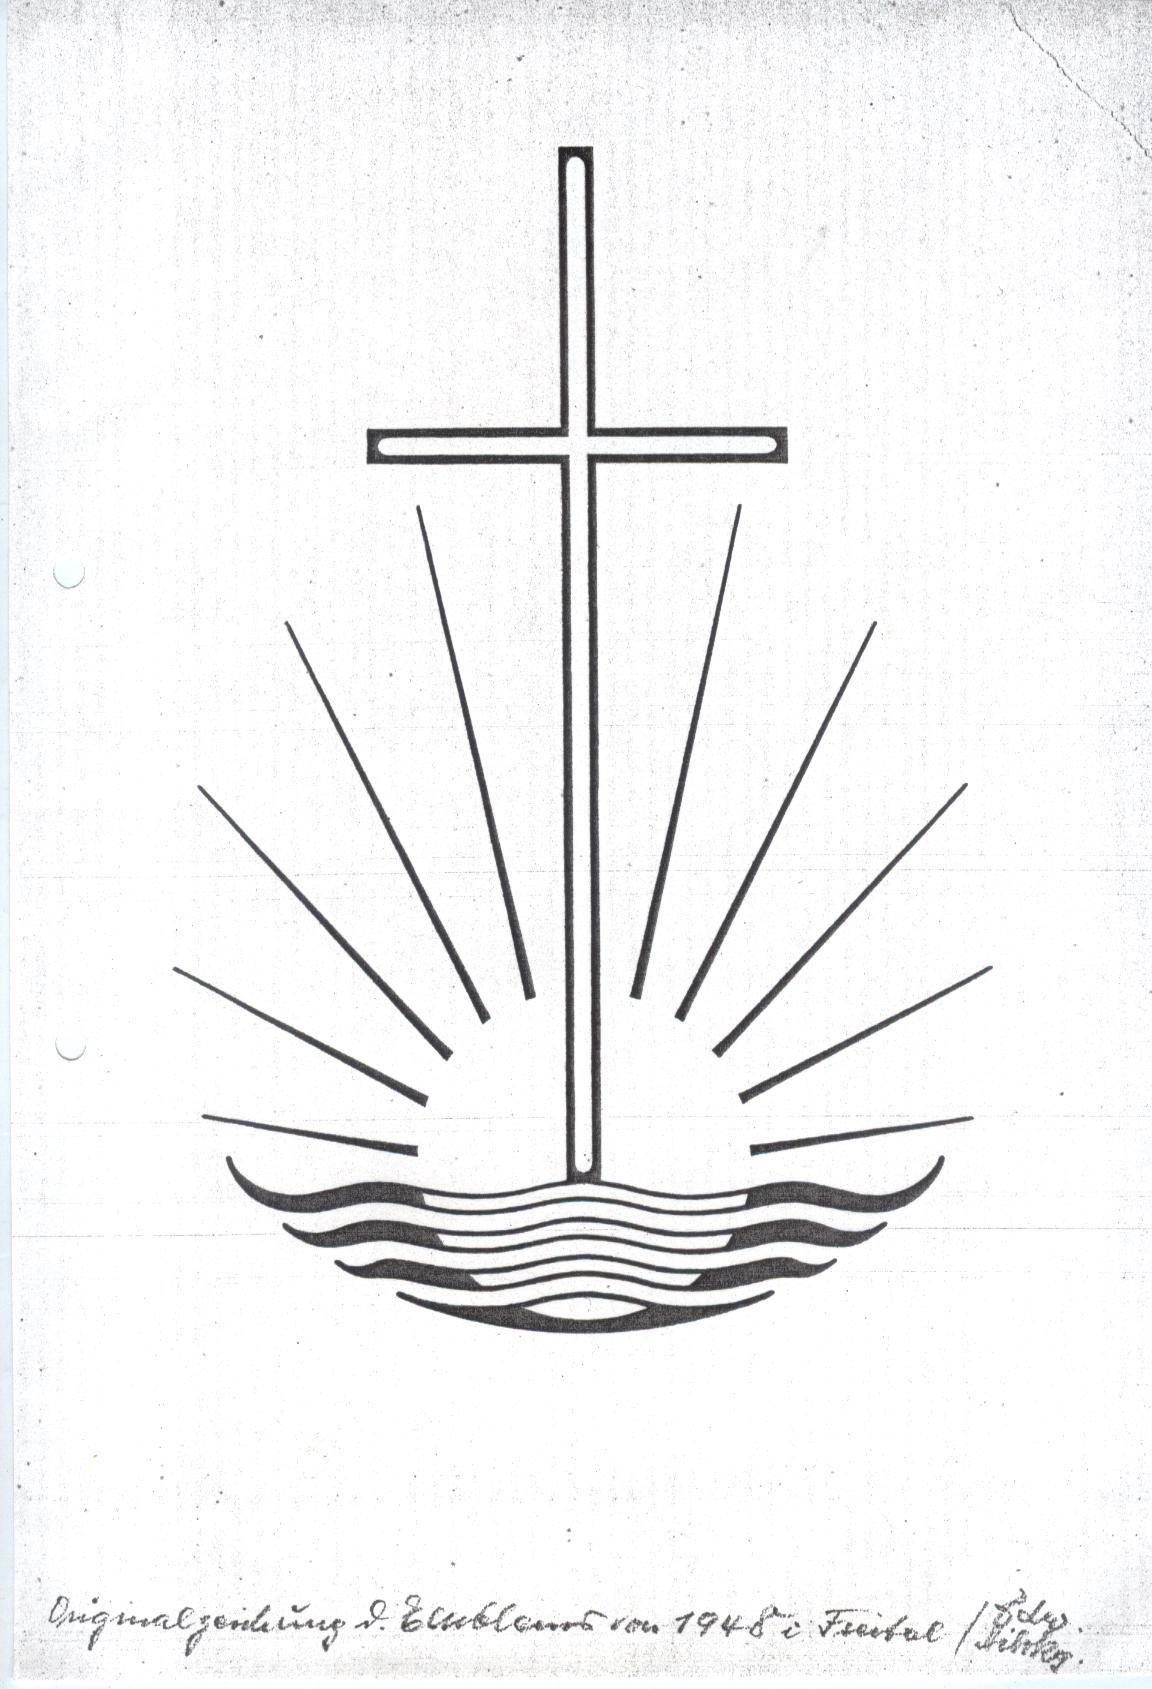 emblem der neuapostolischen kirche apwiki. Black Bedroom Furniture Sets. Home Design Ideas